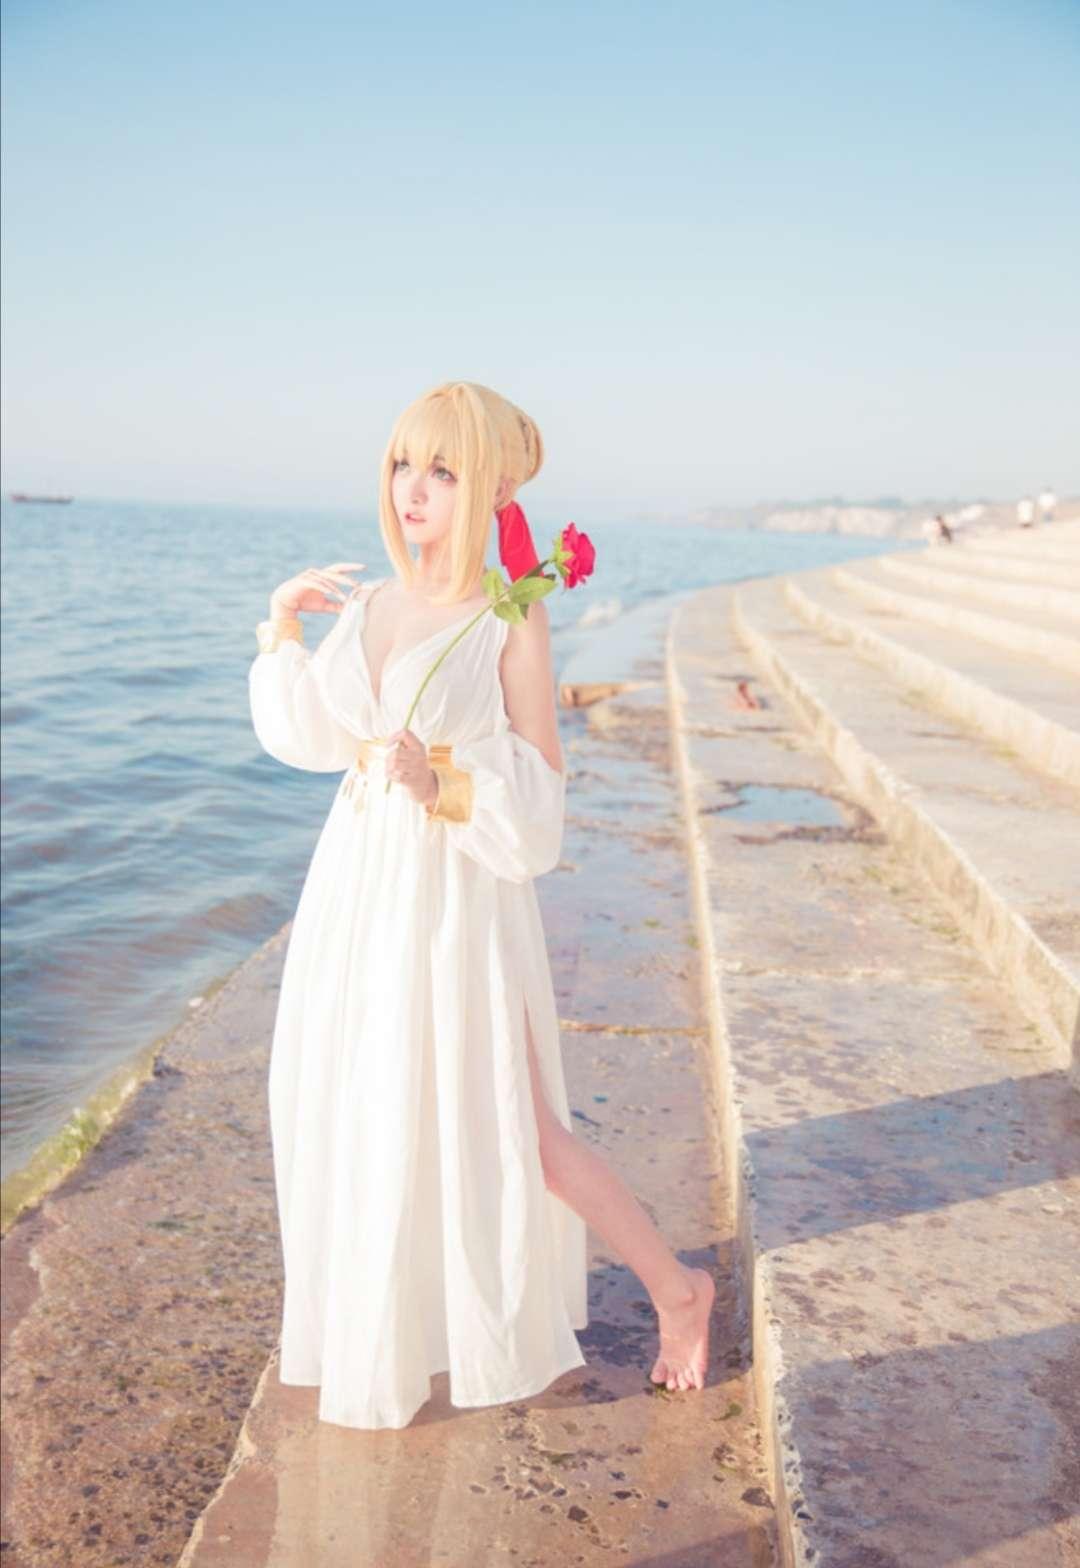 【cos】FateGrand Order 御姐 尼禄·克劳狄乌斯-小柚妹站